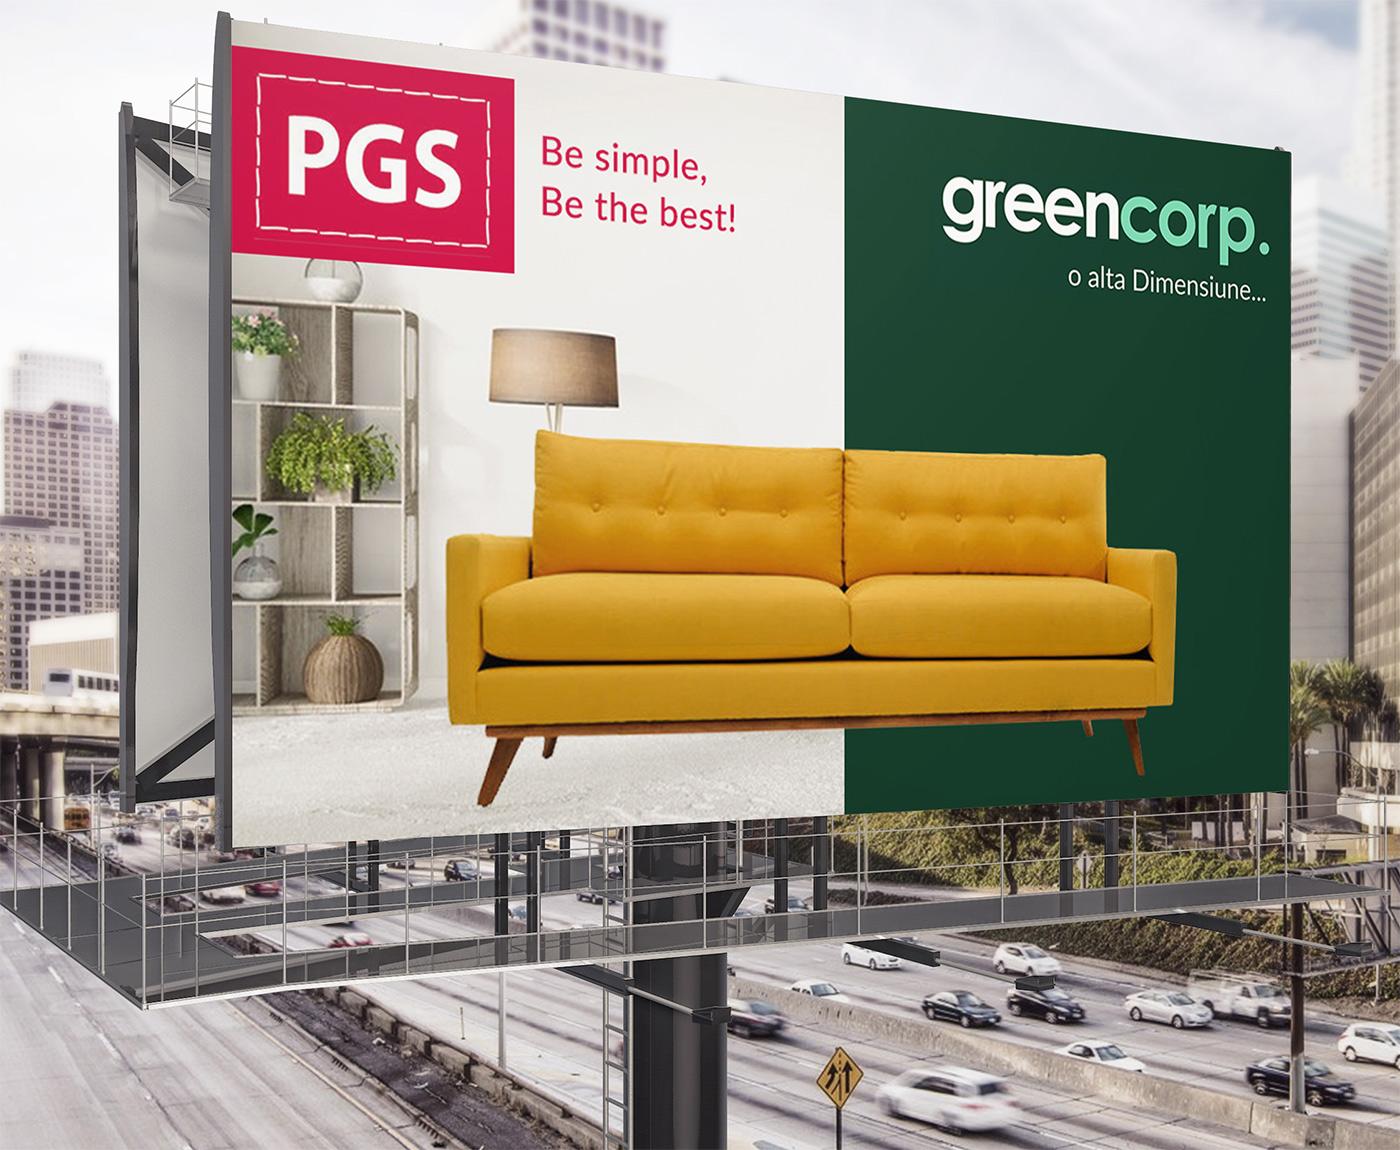 Tapiterie Canapele Oradea.Greencorp Campanii Promovare Print Design Canapele 21vision